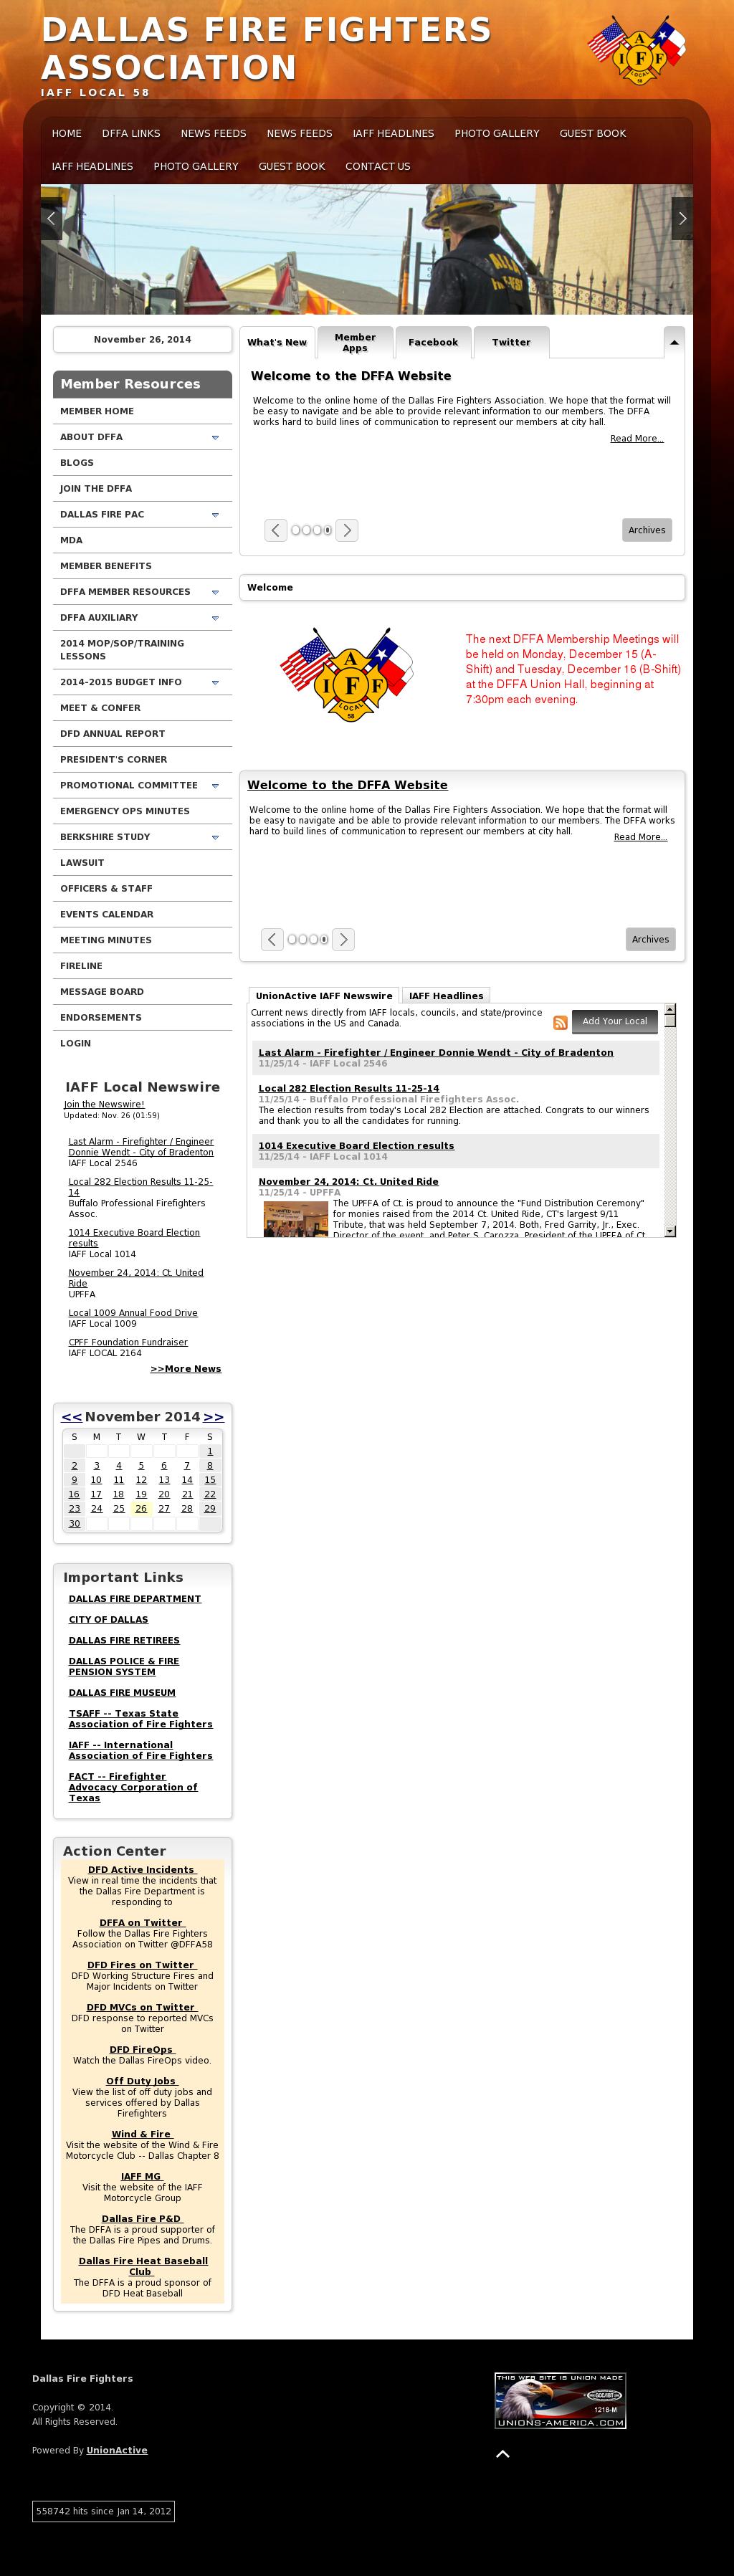 Dffa Competitors, Revenue and Employees - Owler Company Profile